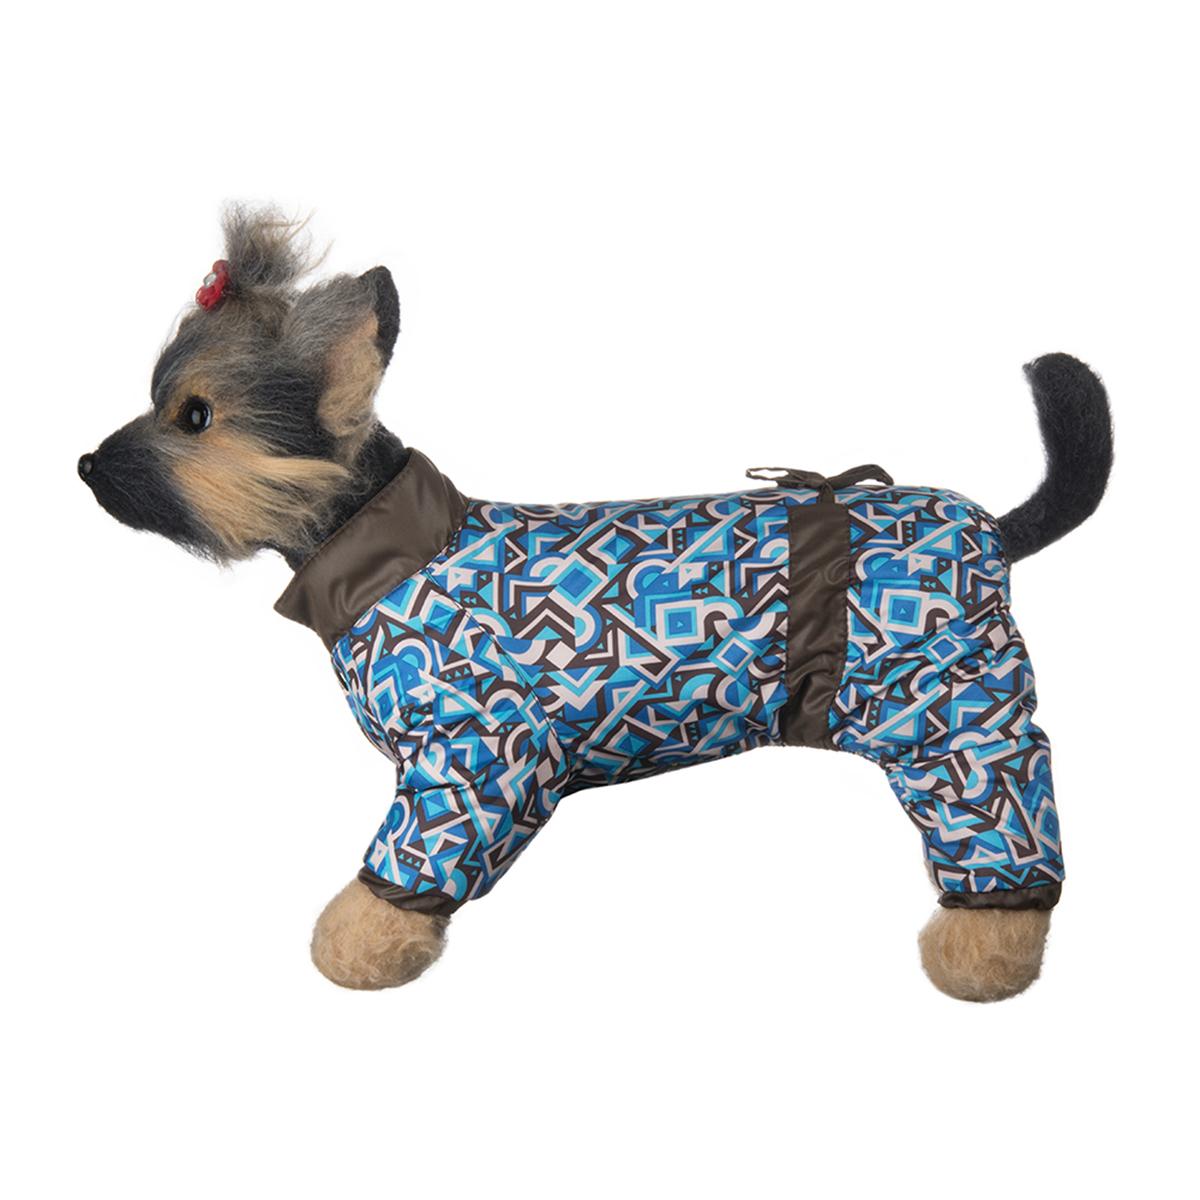 "Комбинезон для собак Dogmoda ""Норд"", зимний, унисекс, цвет: коричневый, бежевый, голубой. Размер 1 (S)"